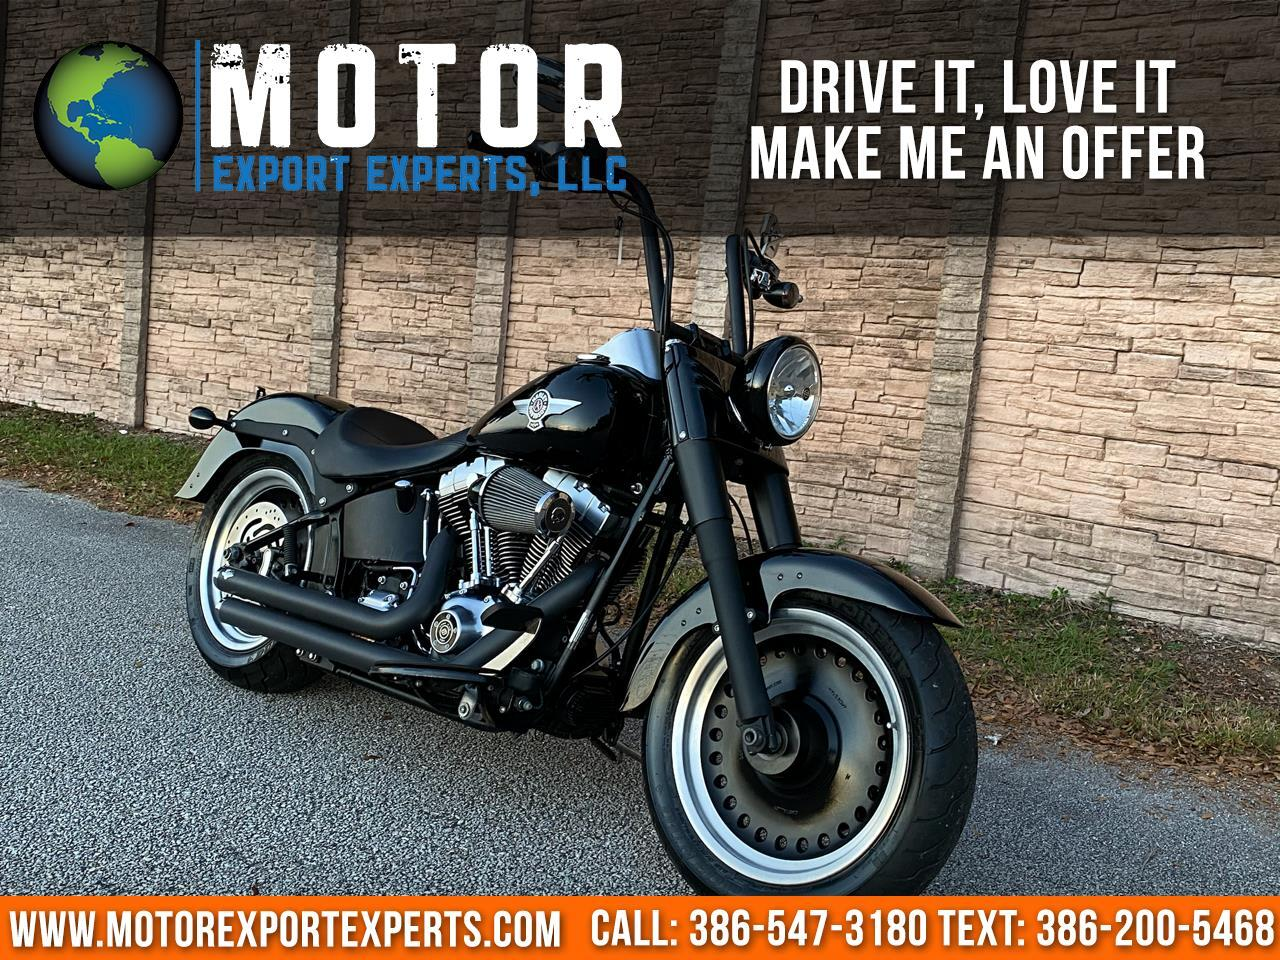 2010 Harley-Davidson FLSTFB FAT BOY LOW